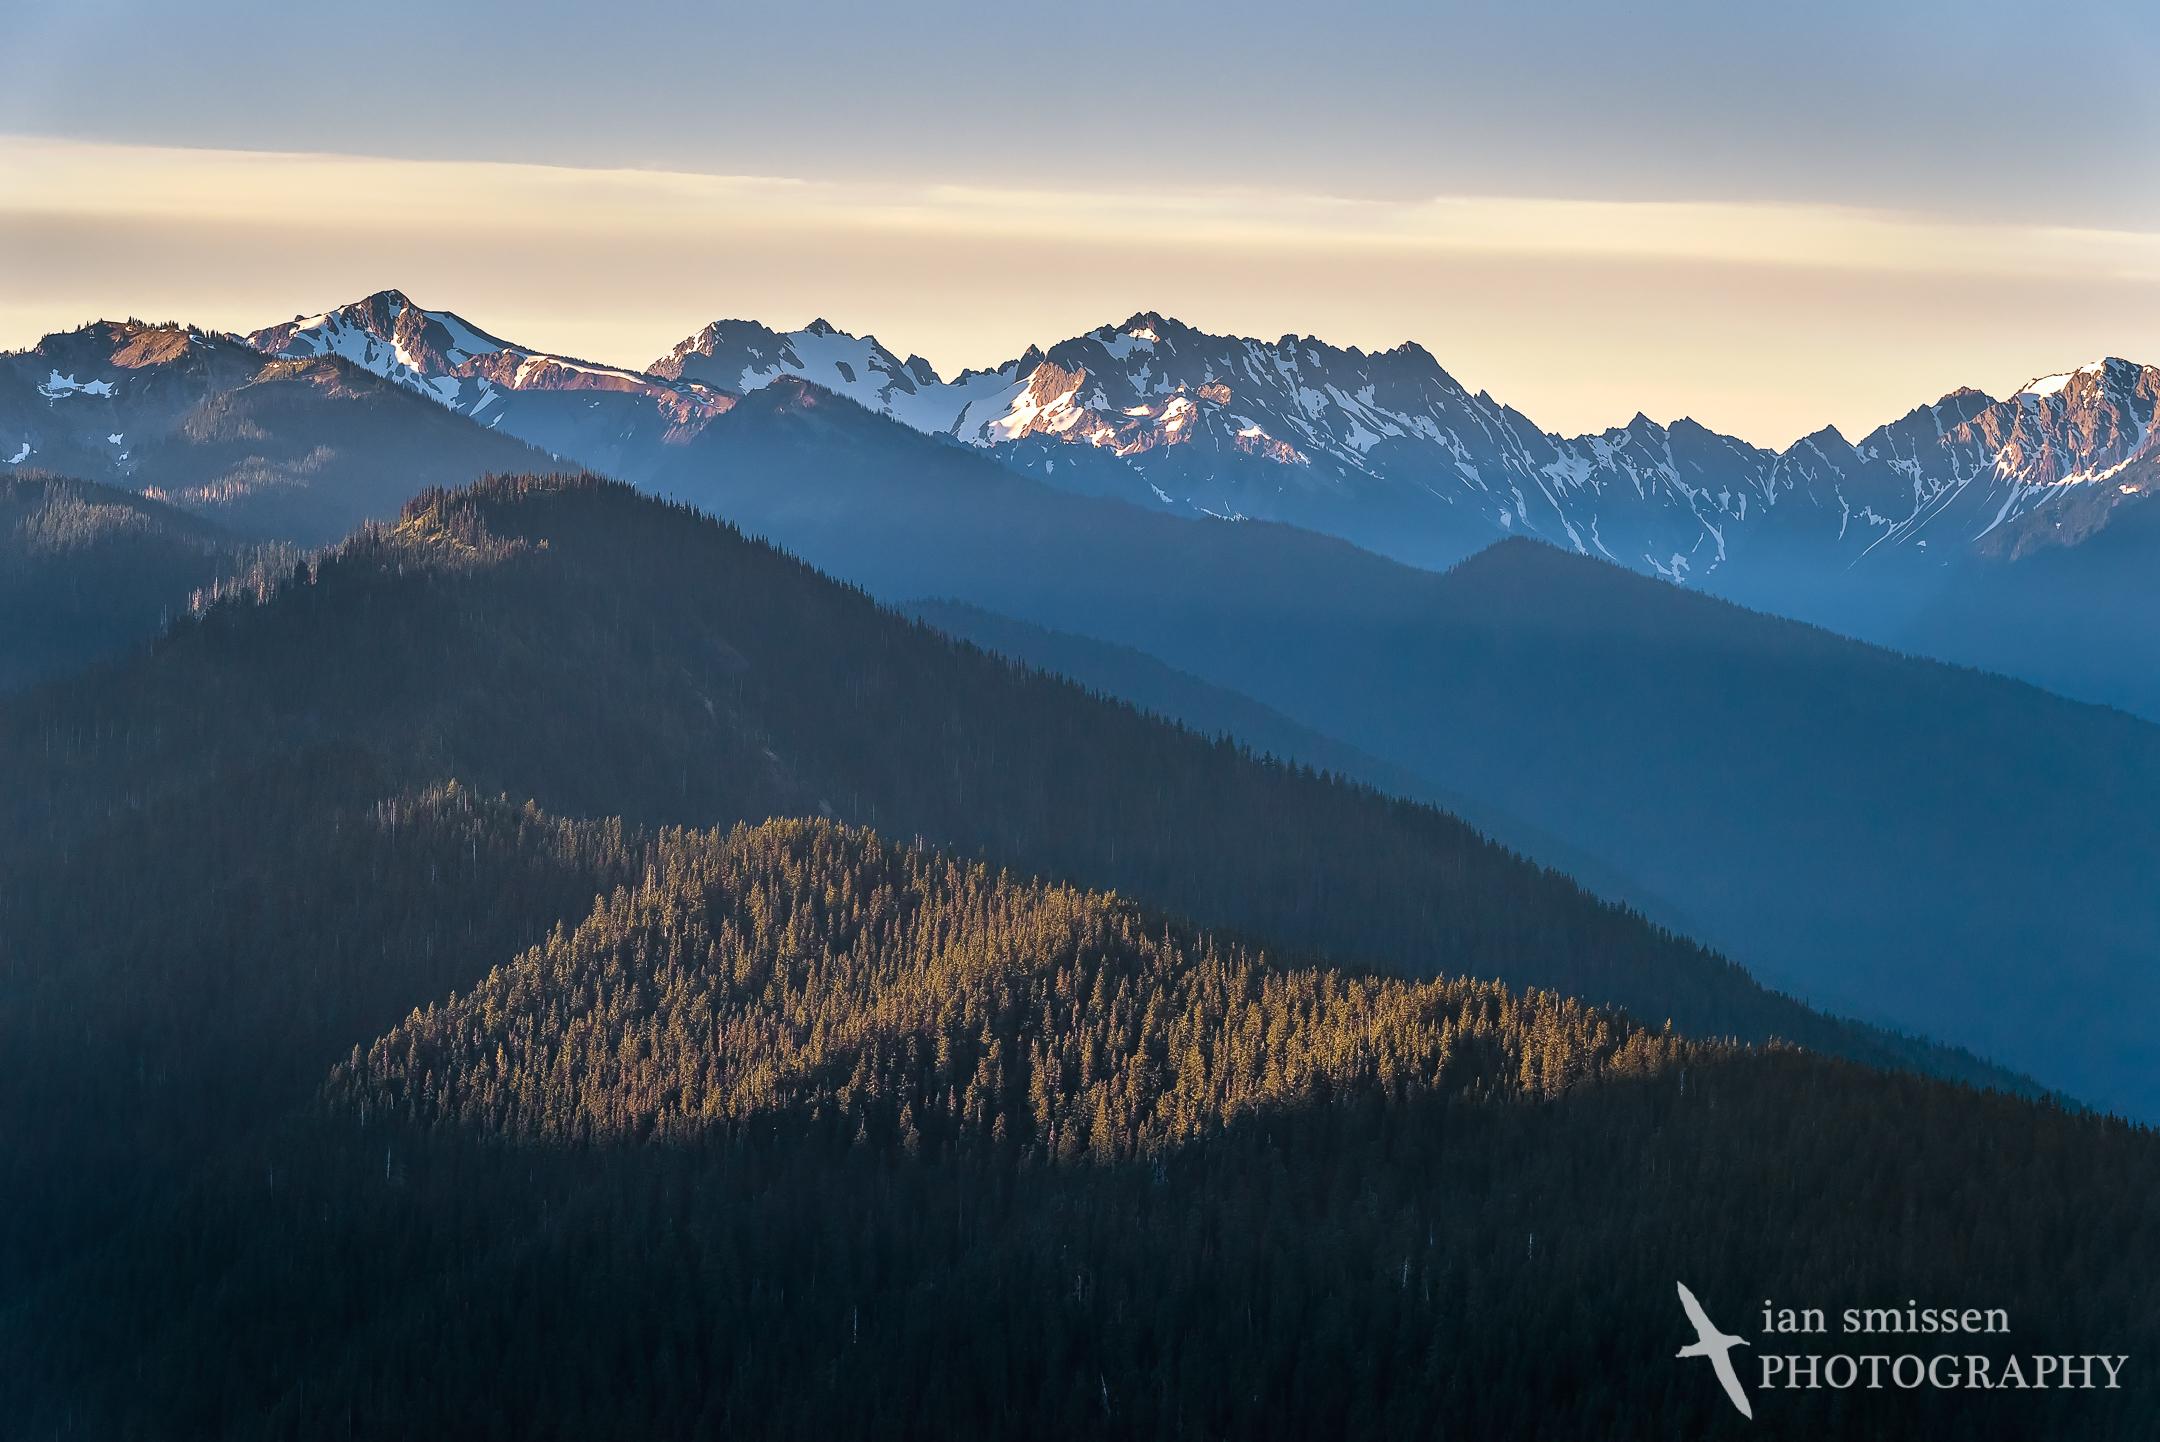 First sunlight on the mountains, Hurricane Ridge